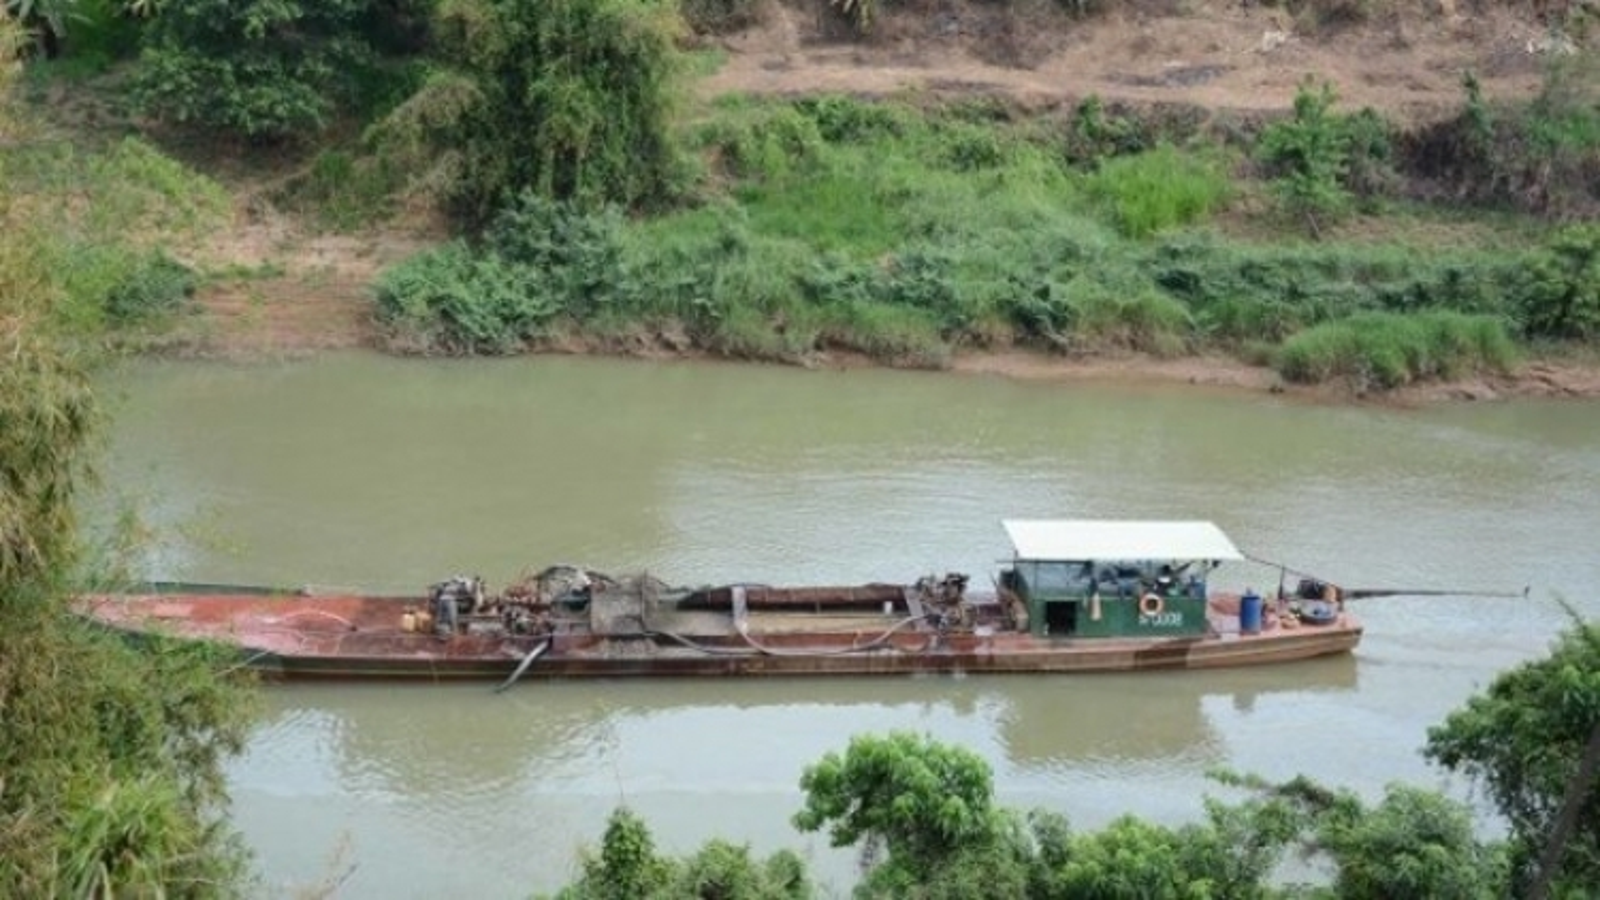 Landslide havoc prompts ban on sand mining in Dong Nai River